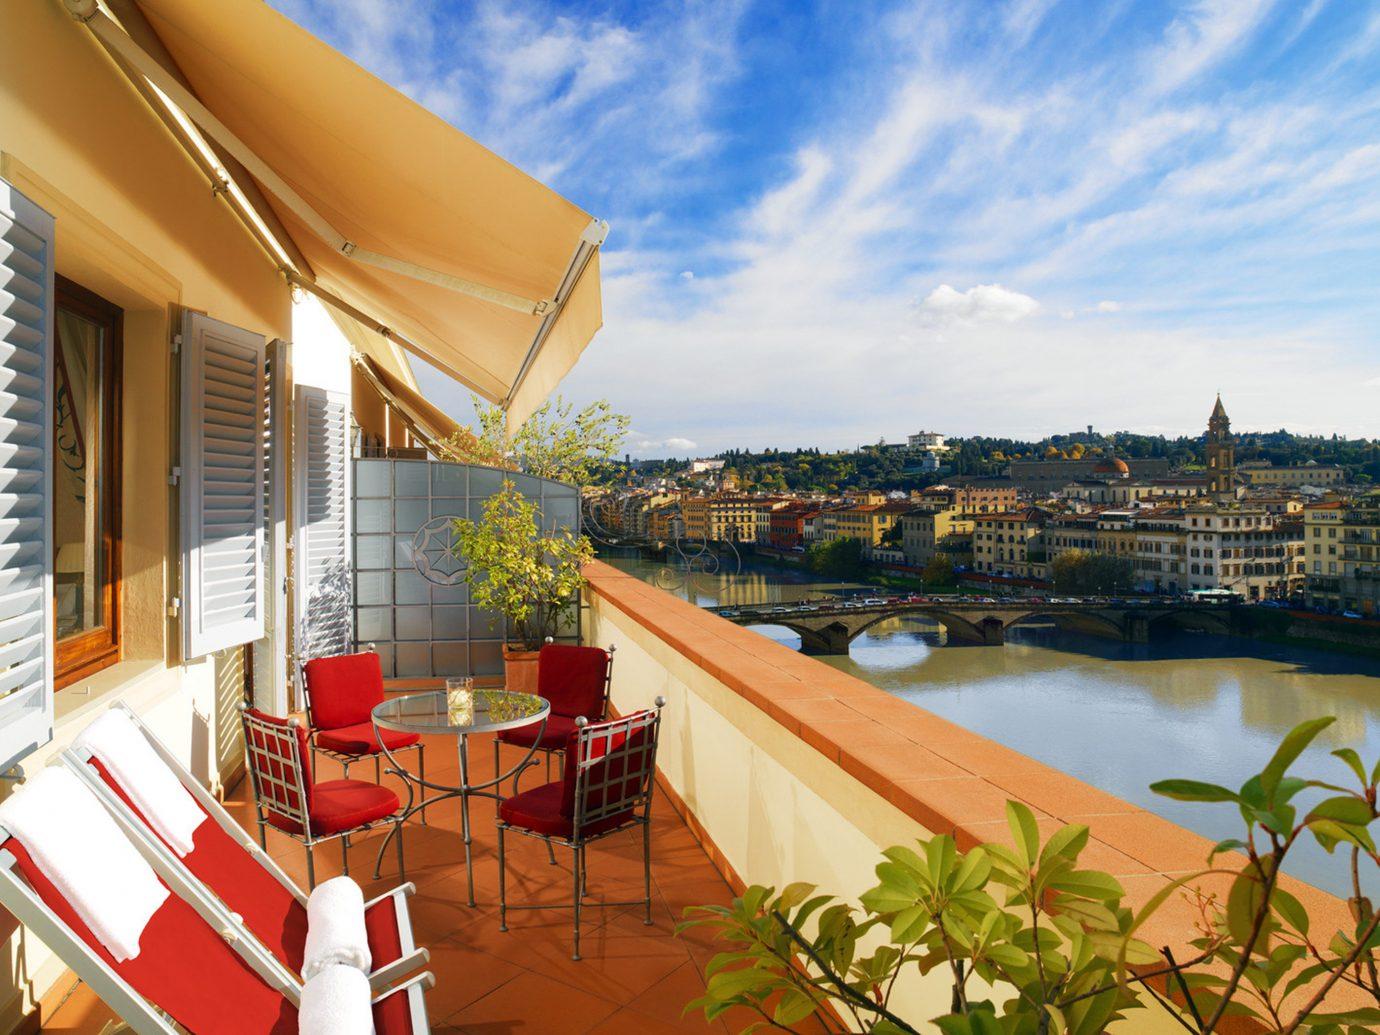 Elegant Florence Hotels Italy Luxury Terrace Waterfront leisure property vacation Resort estate real estate Villa furniture